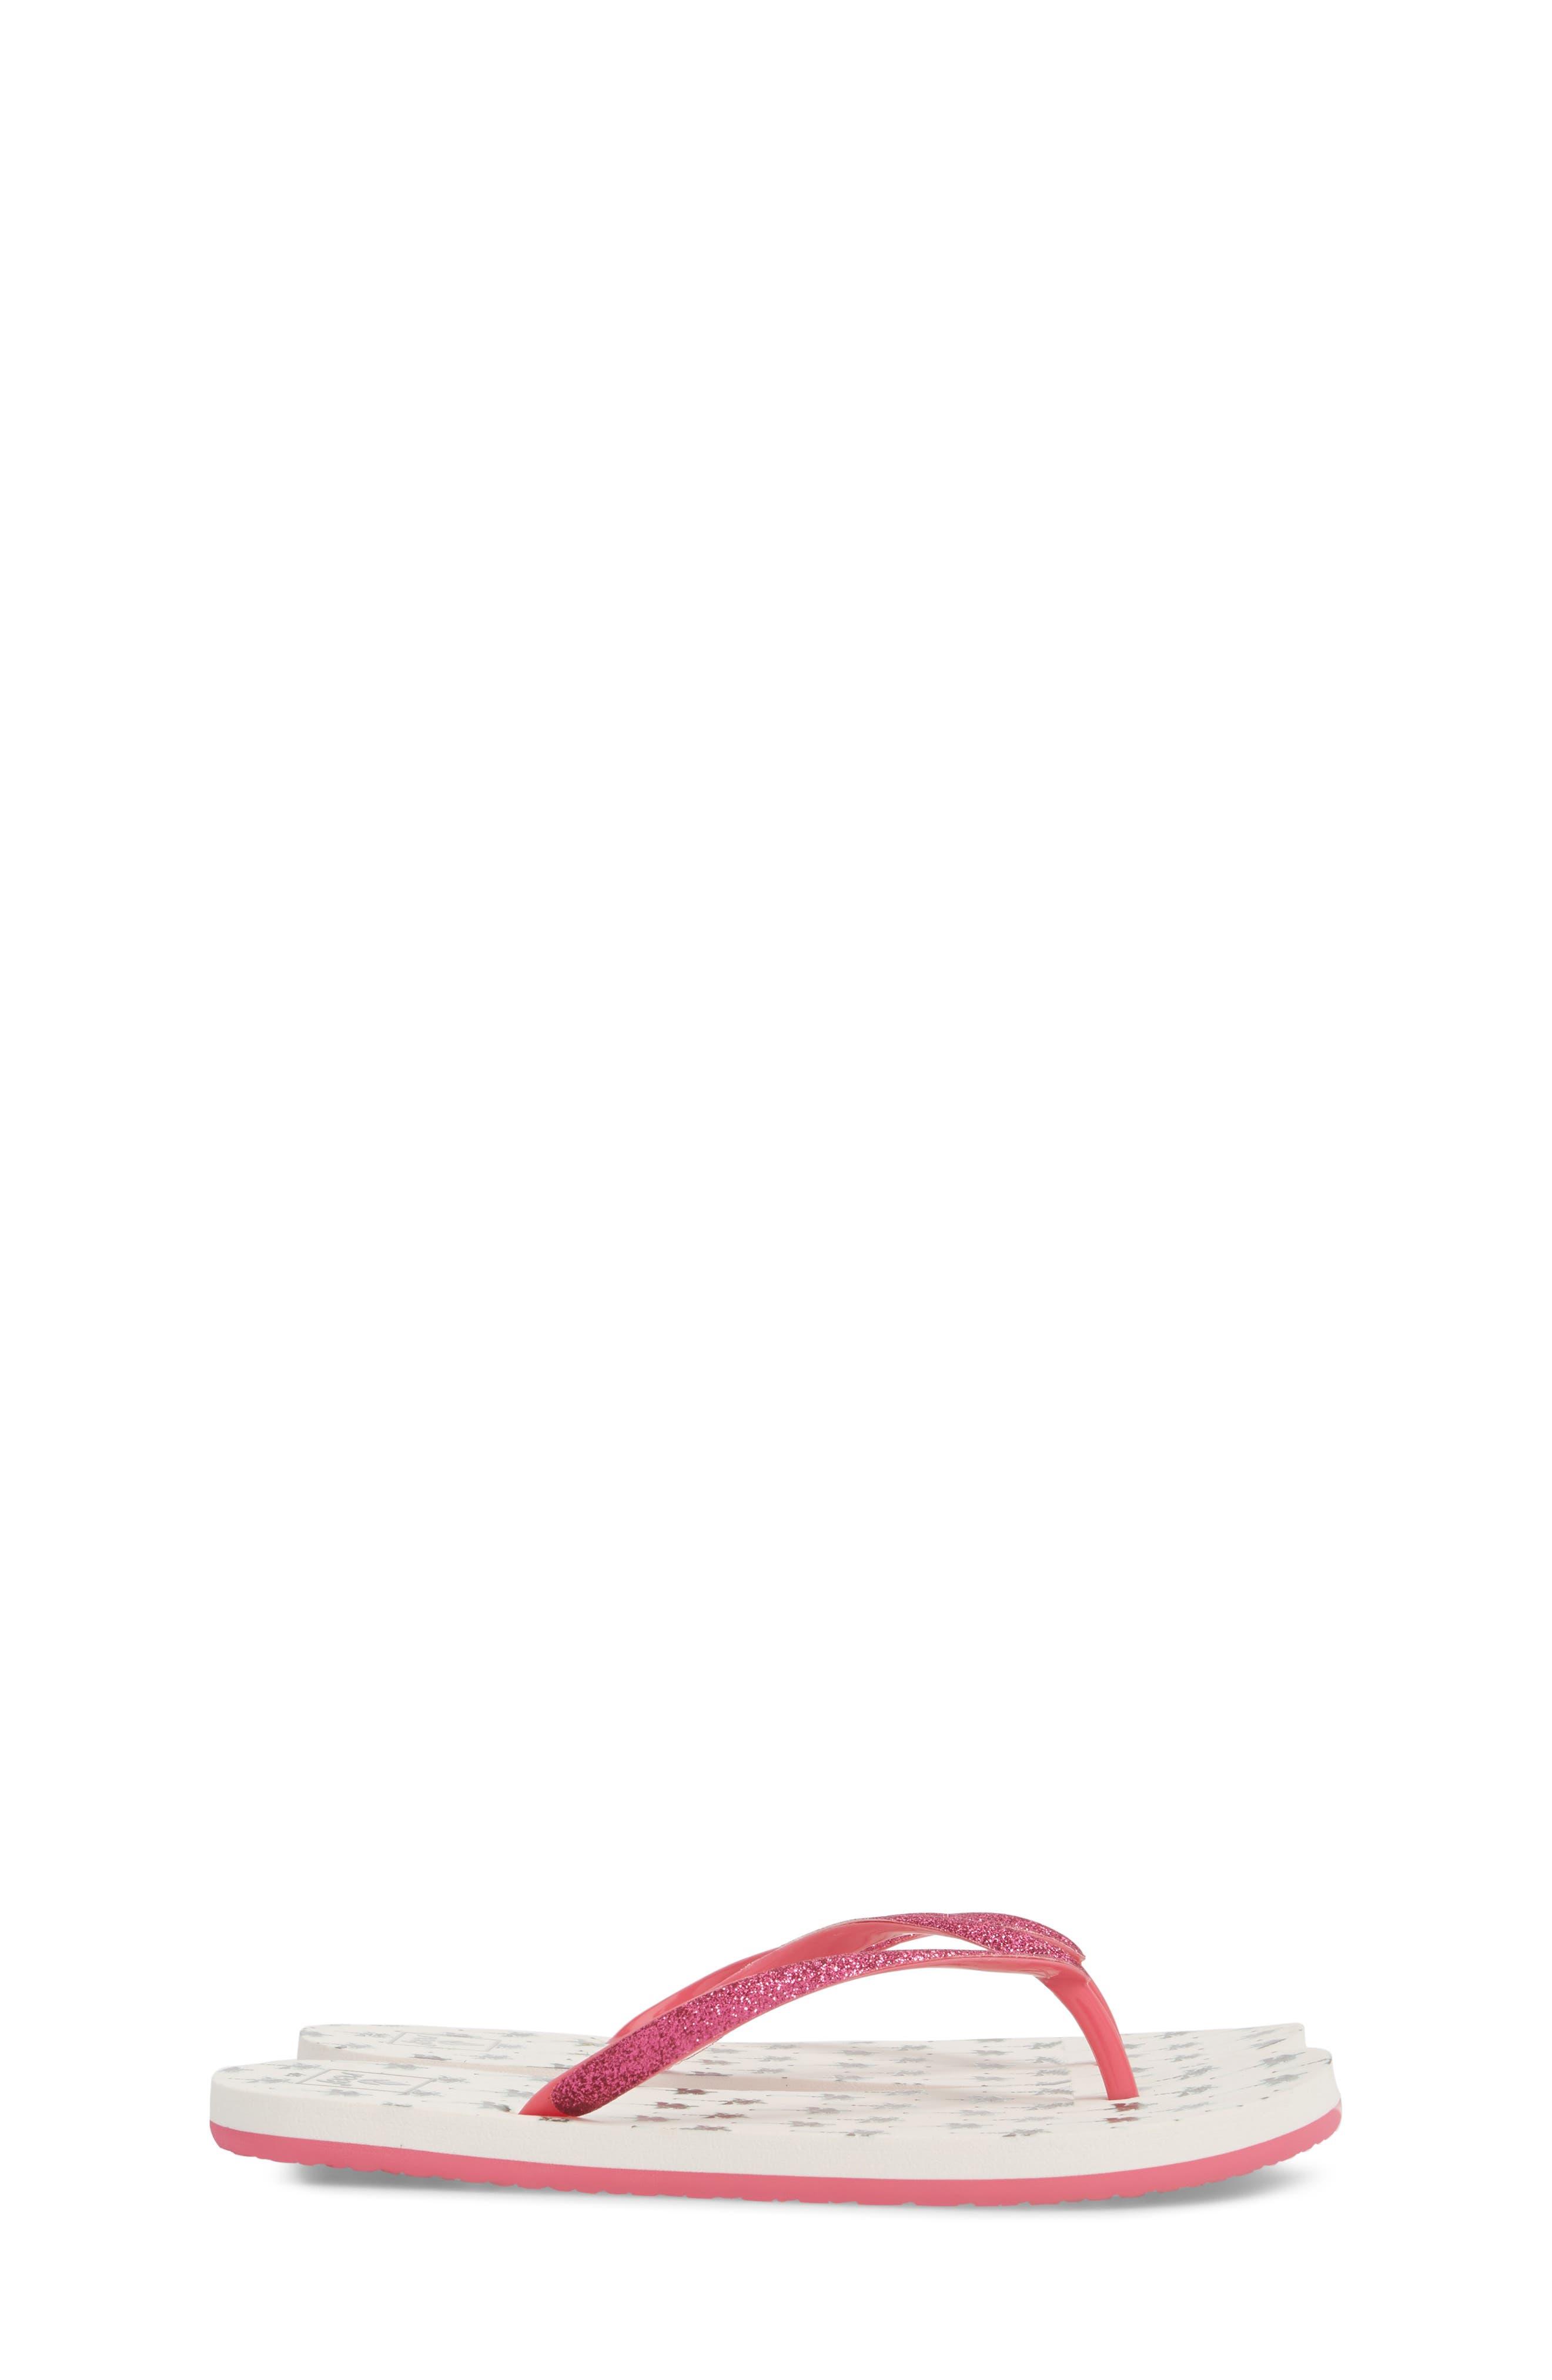 REEF, Little Stargazer Print Flip Flop, Alternate thumbnail 4, color, 105